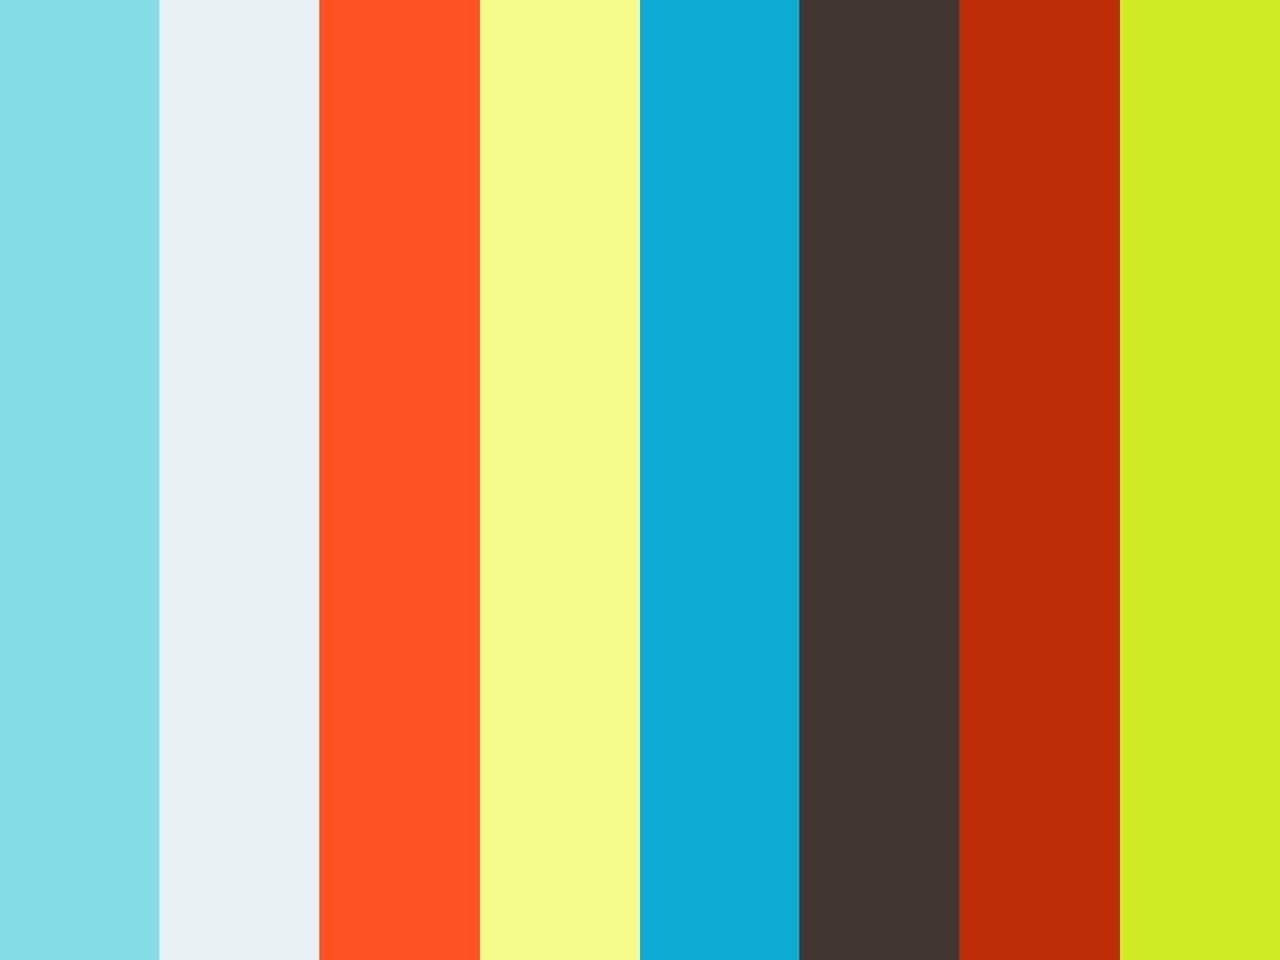 Brandmovie: AudioEye Maastricht - Producties, audio- en lichtverhuur